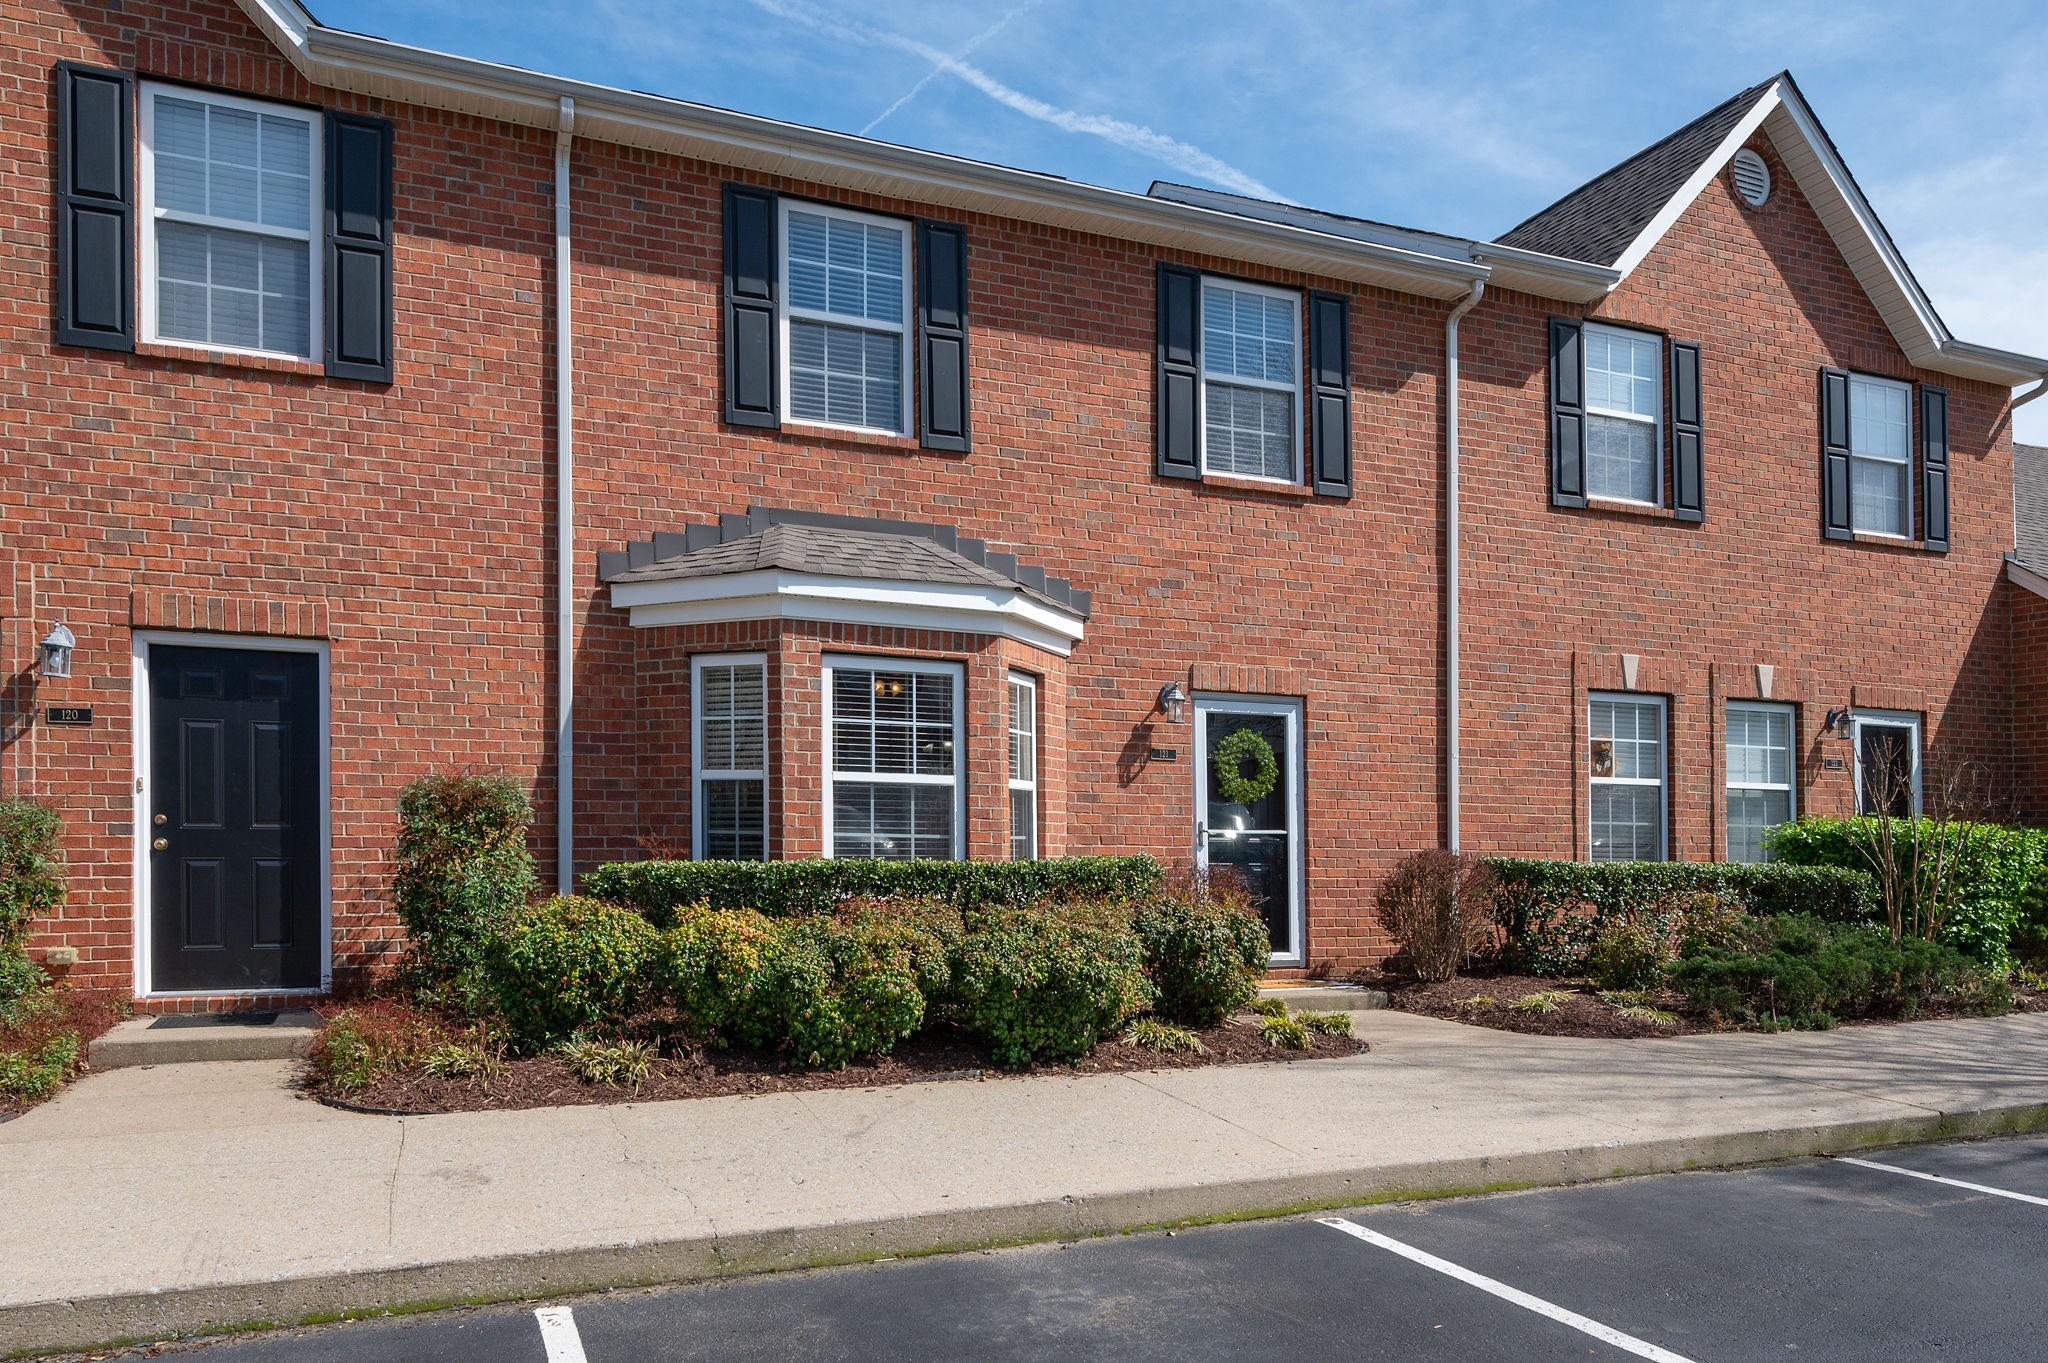 1101 Downs Blvd, Franklin, TN 37064 - Franklin, TN real estate listing